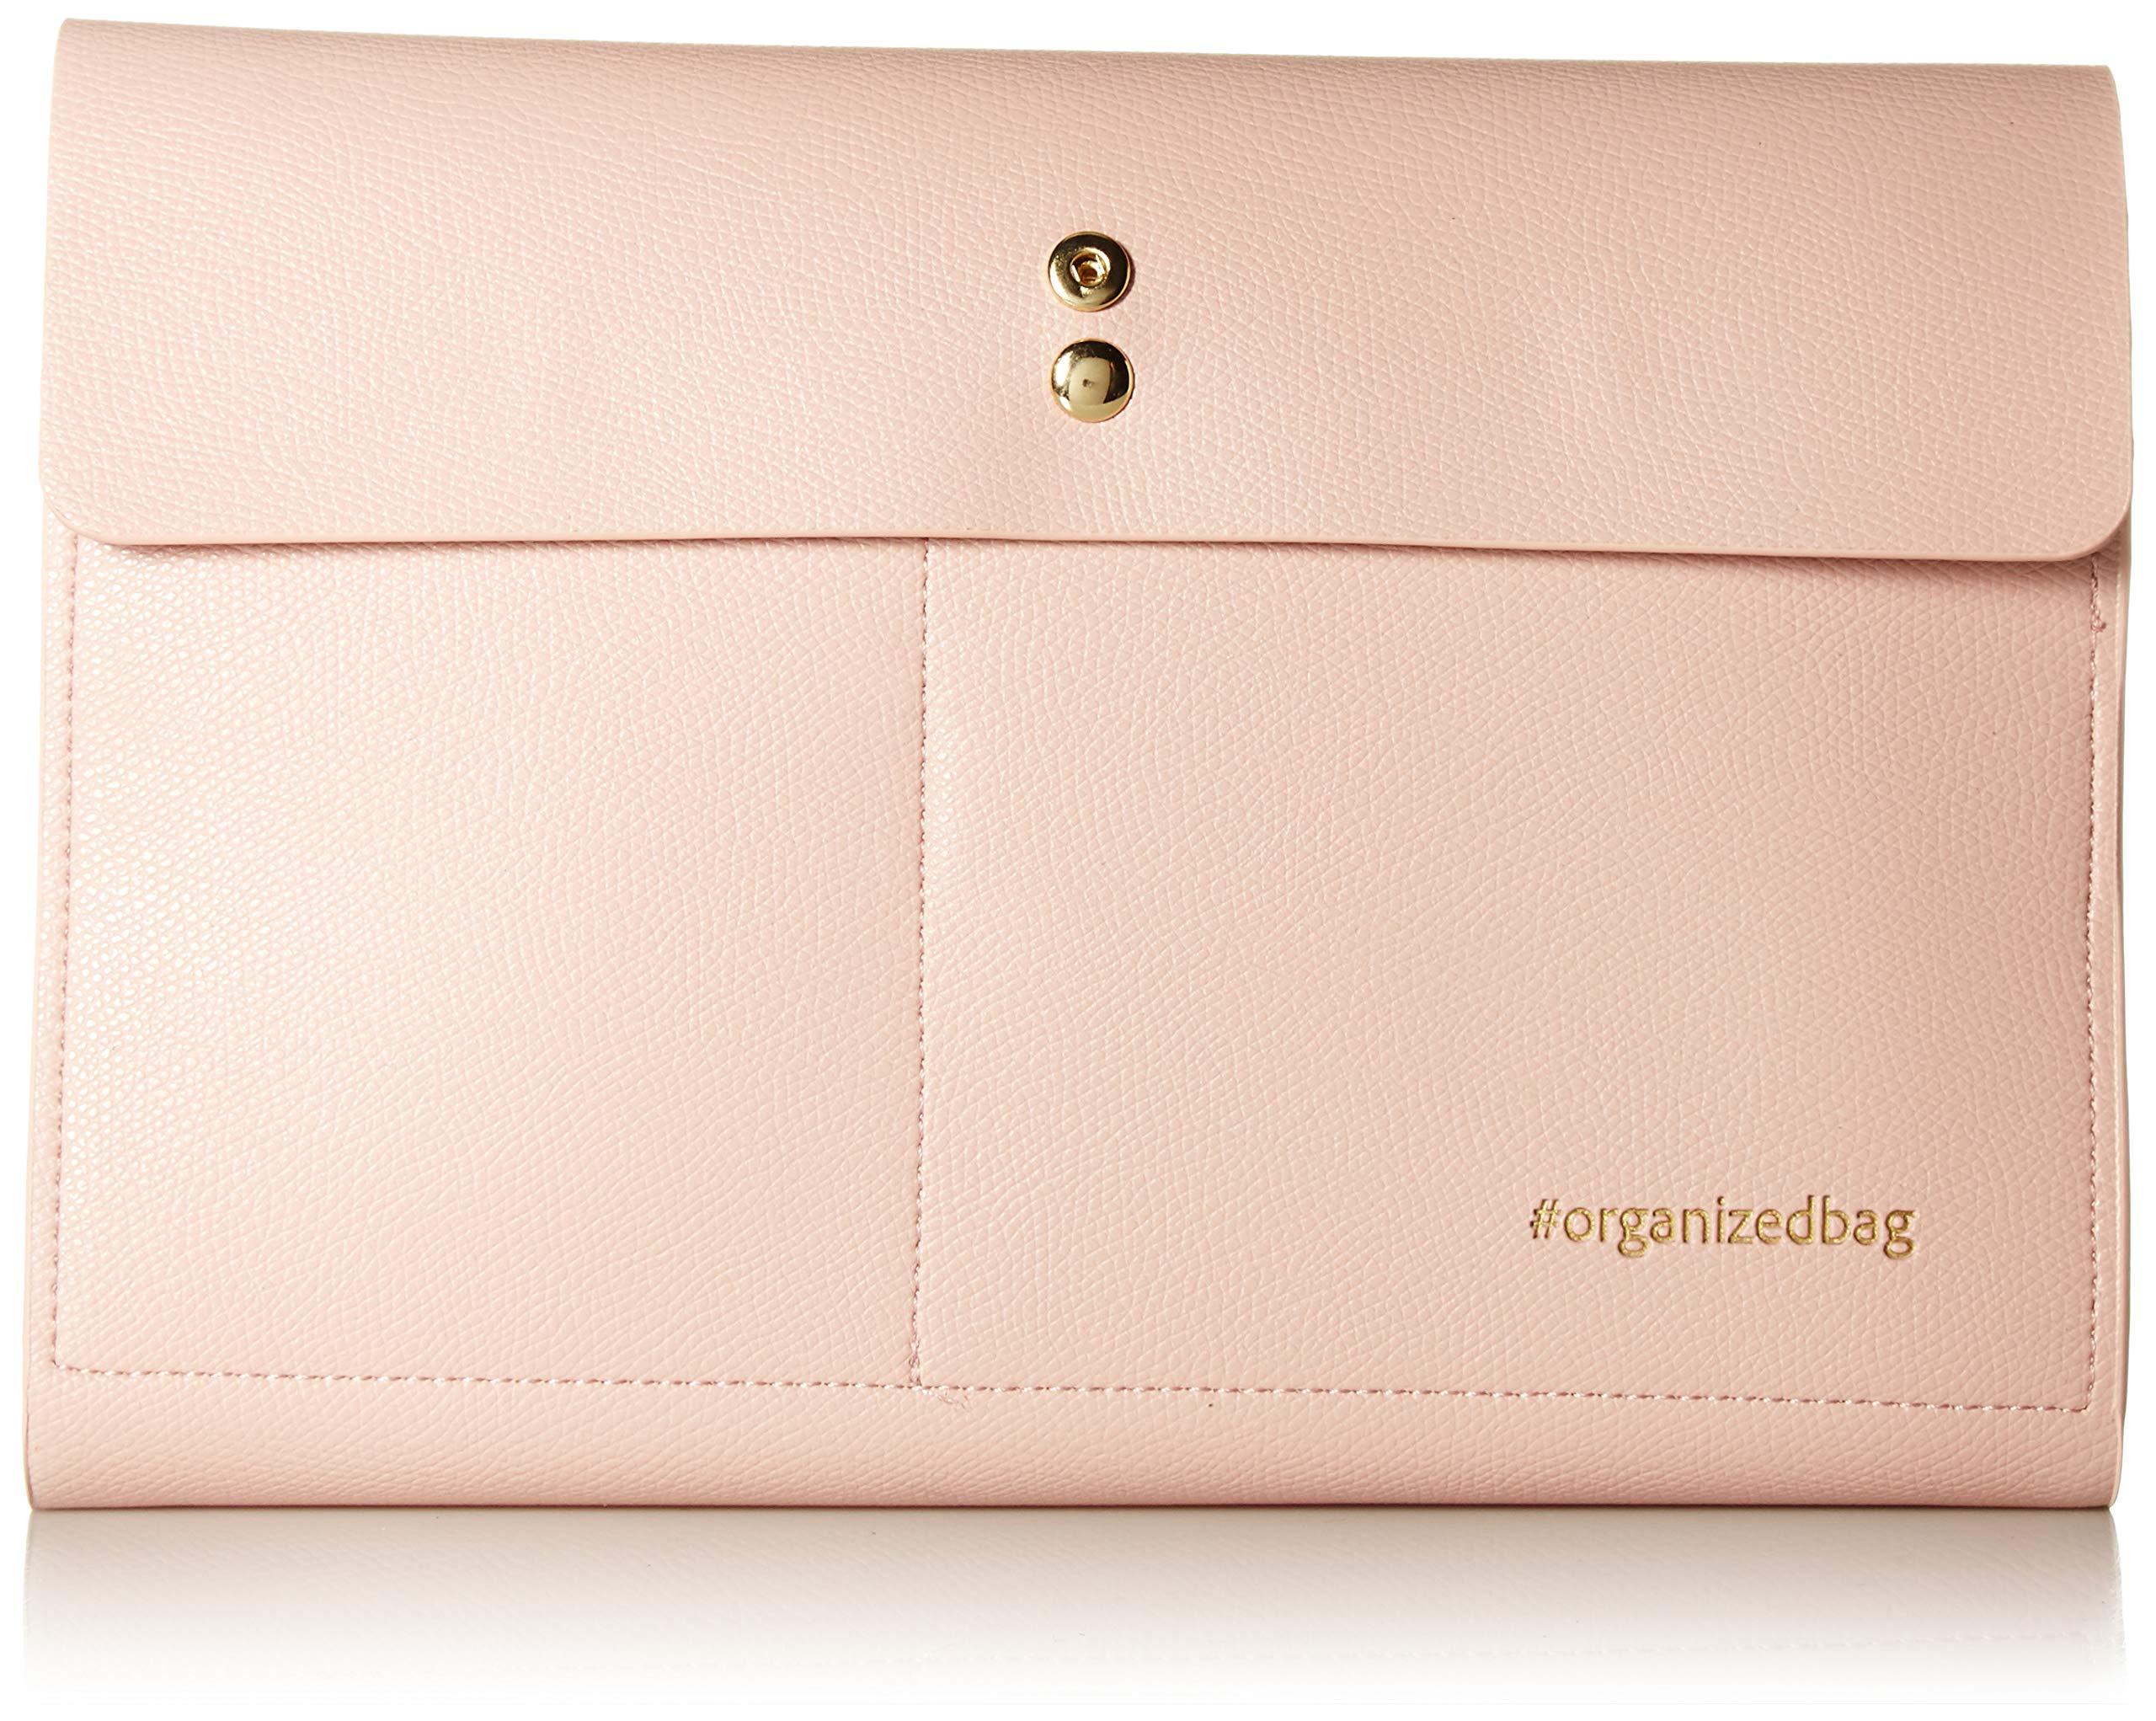 OrganizedBag Whitley Handbag Organizer, Pink